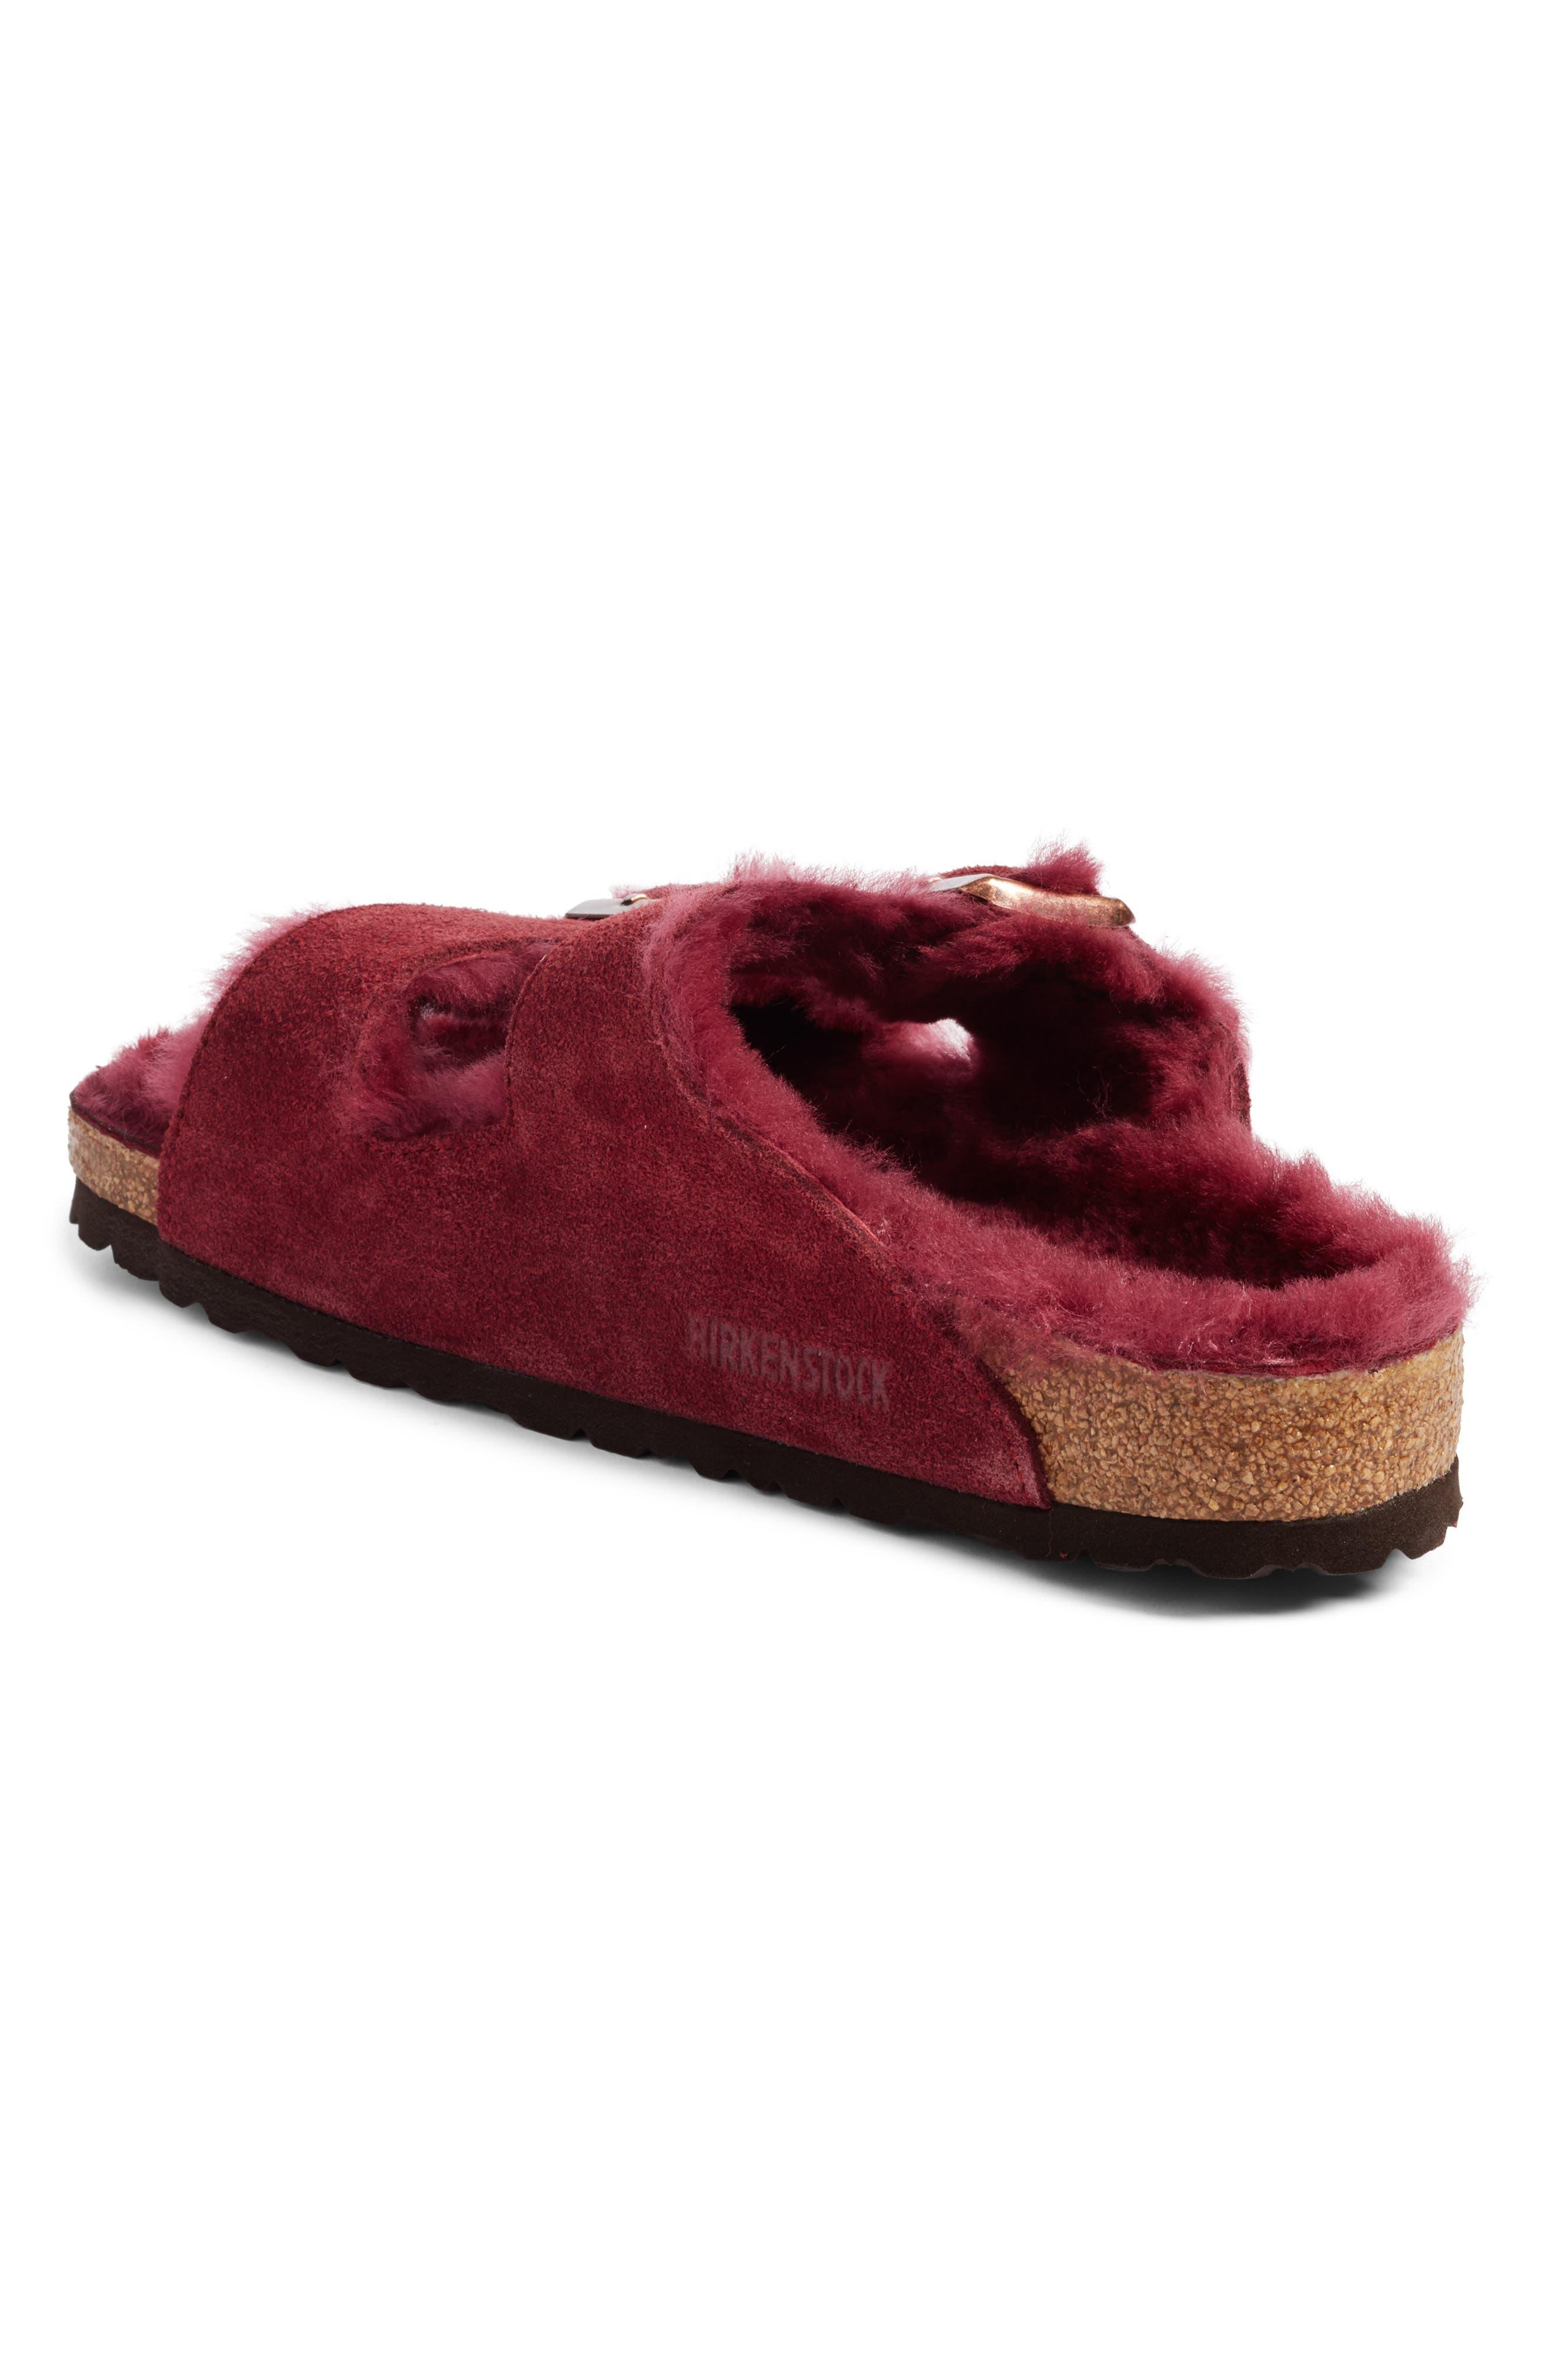 Arizona Genuine Shearling Lined Slide Sandal,                             Alternate thumbnail 2, color,                             Bordeaux / Bordeaux